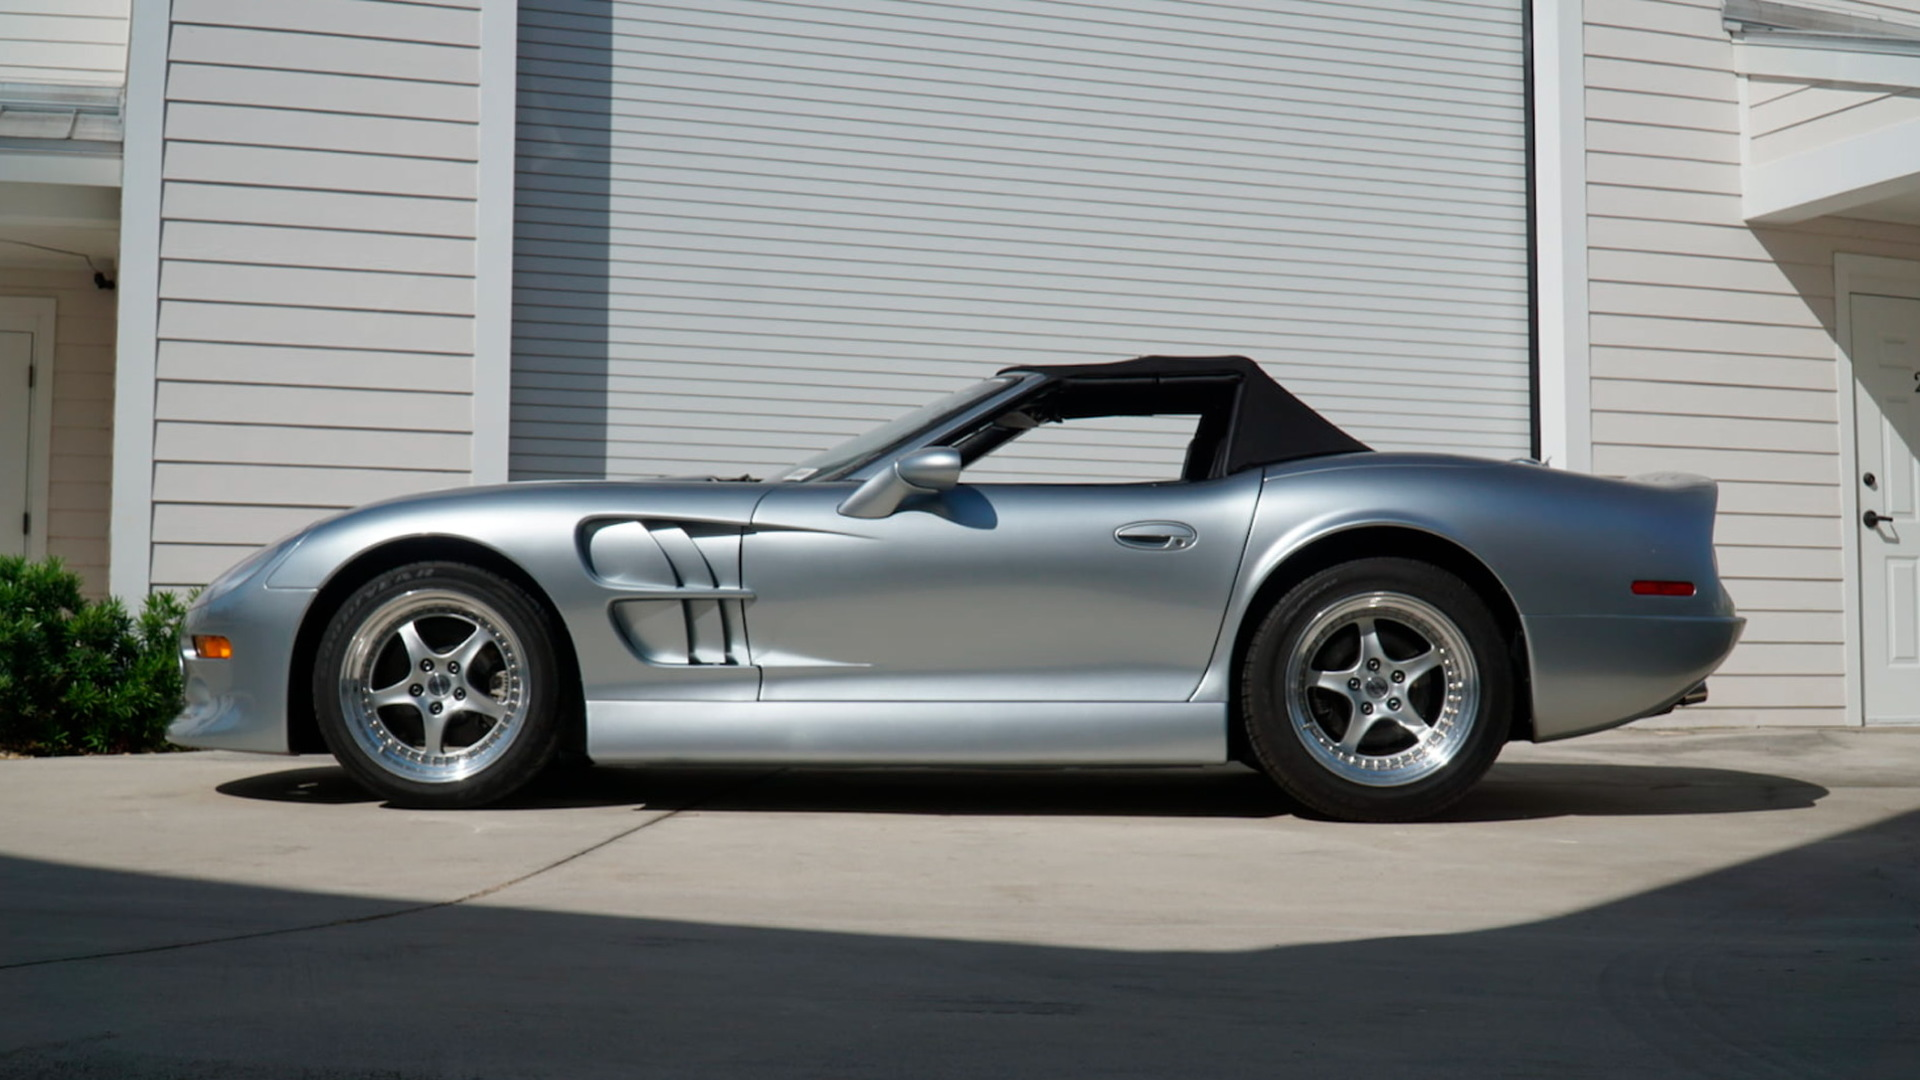 1999 Shelby Series 1 - Photo credit: Mecum